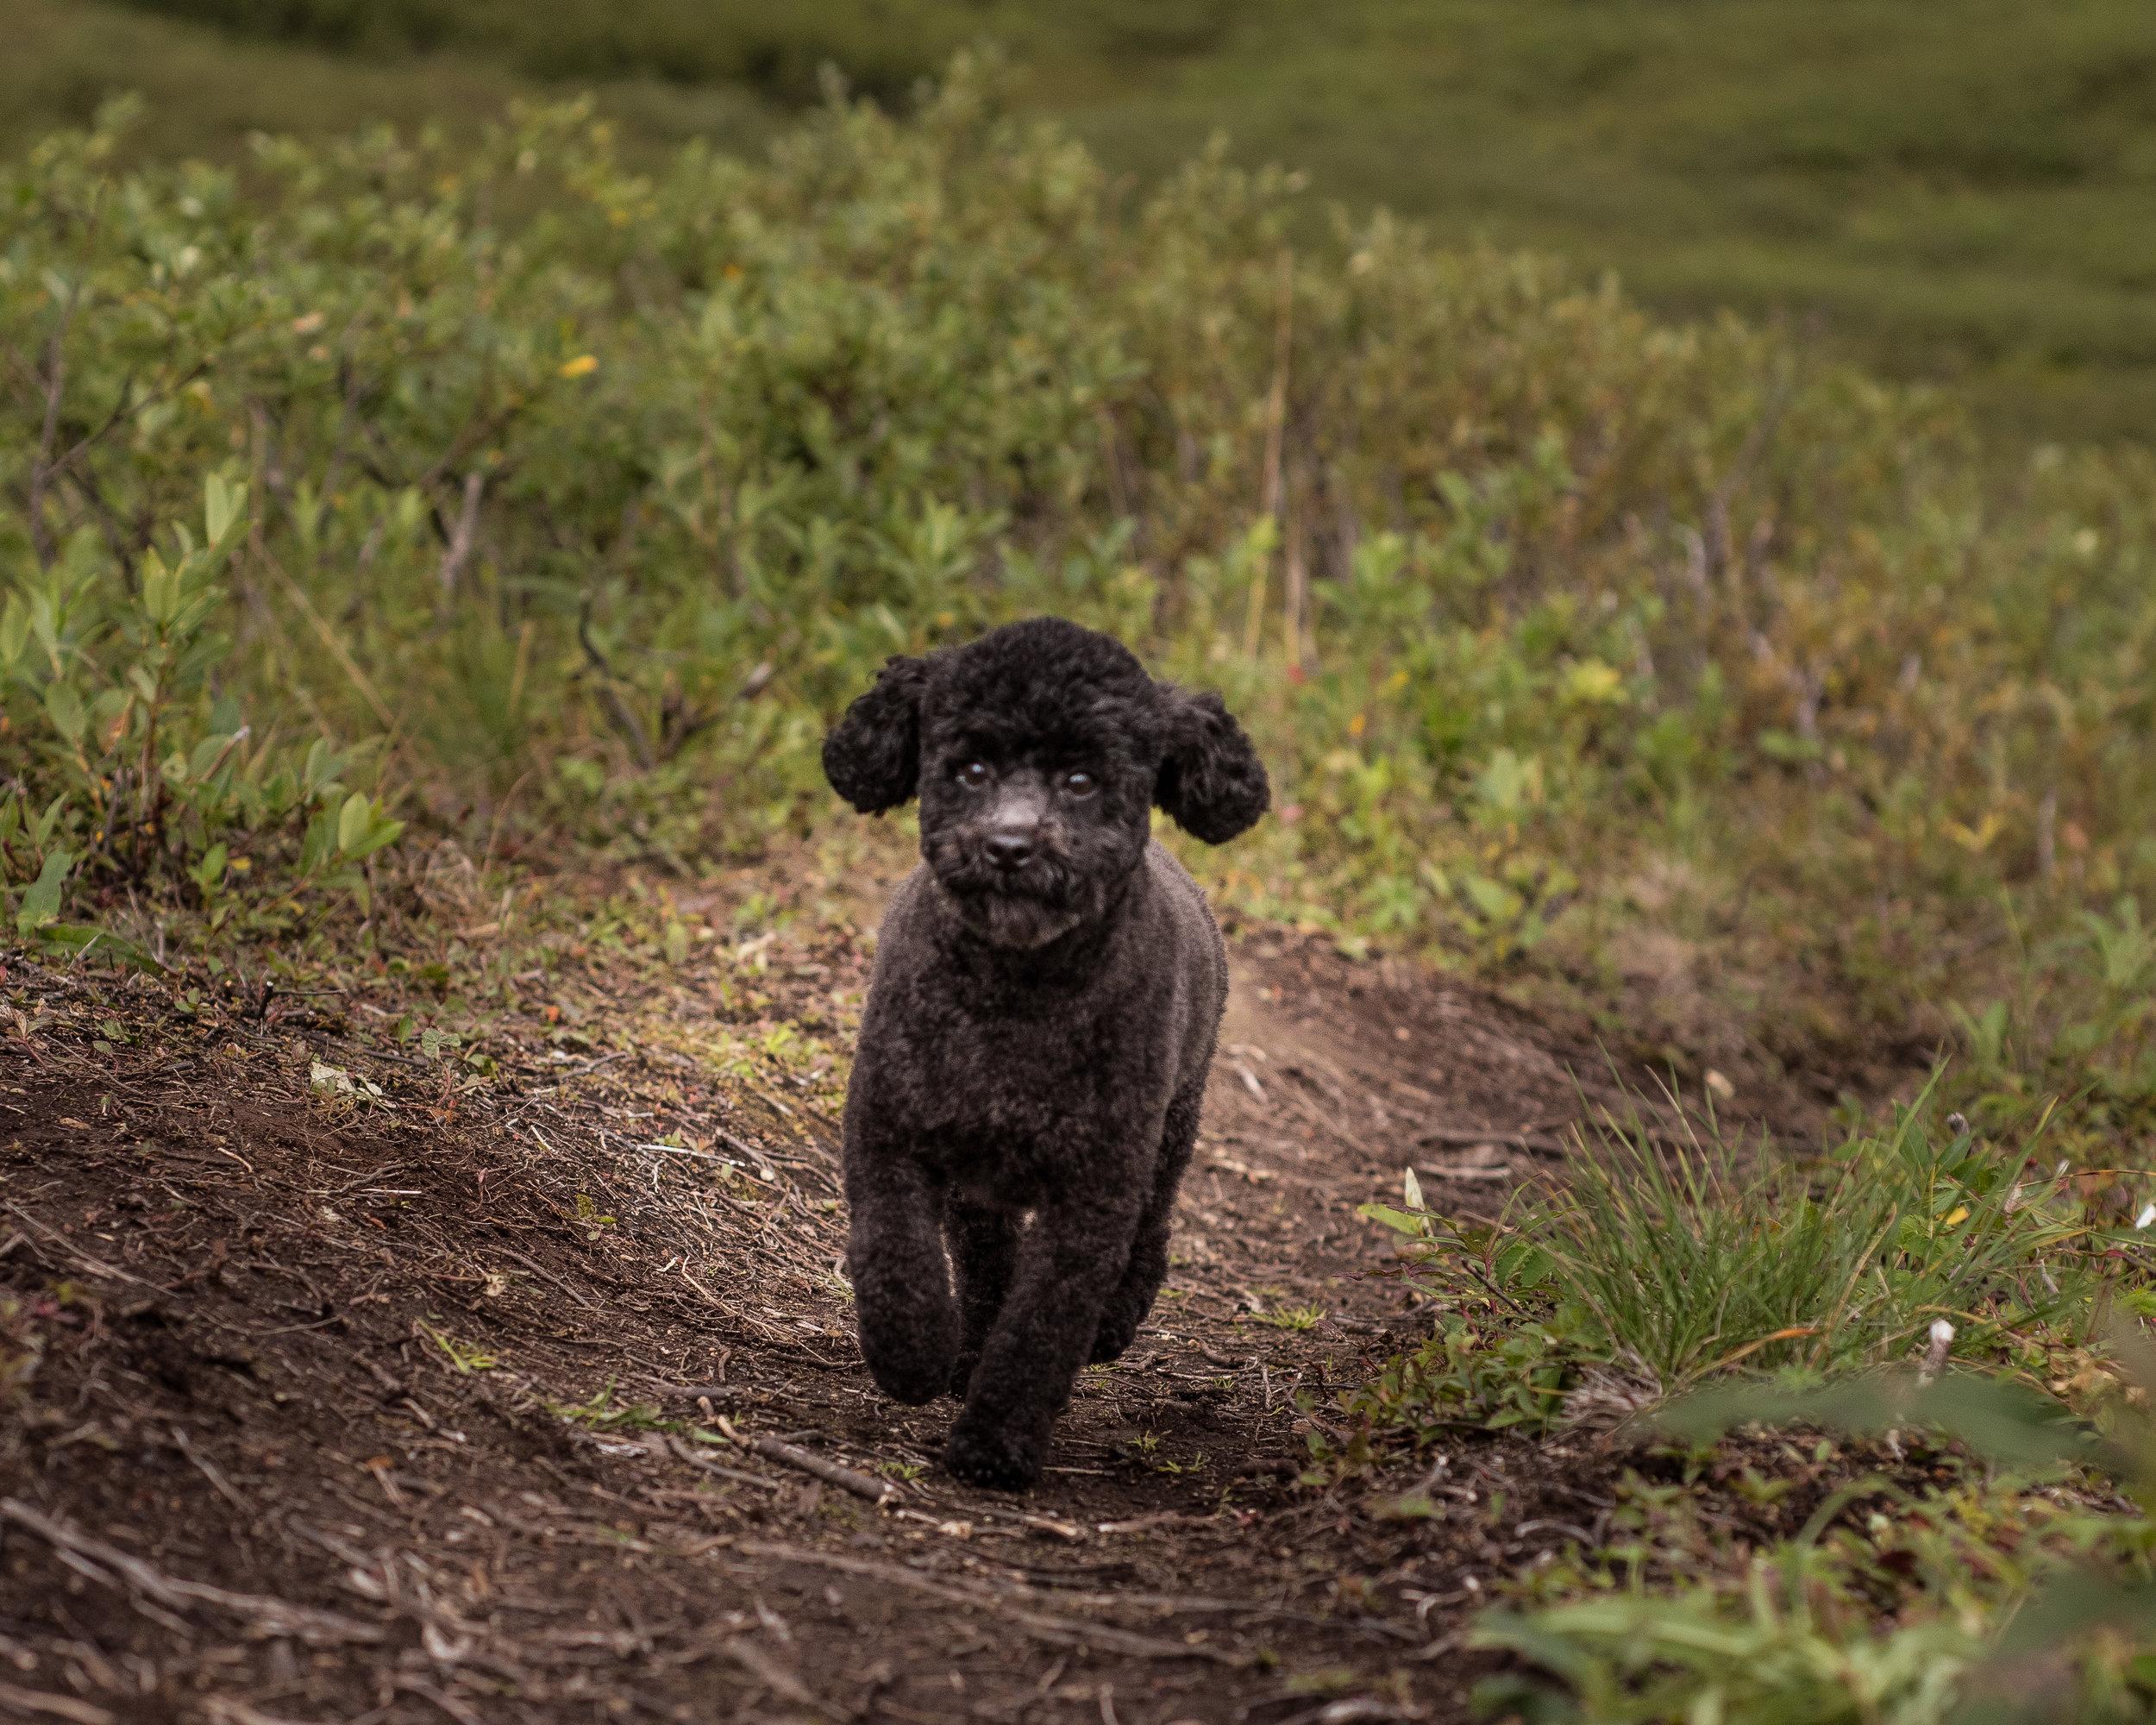 A poodle is a poodle, regardless of size!